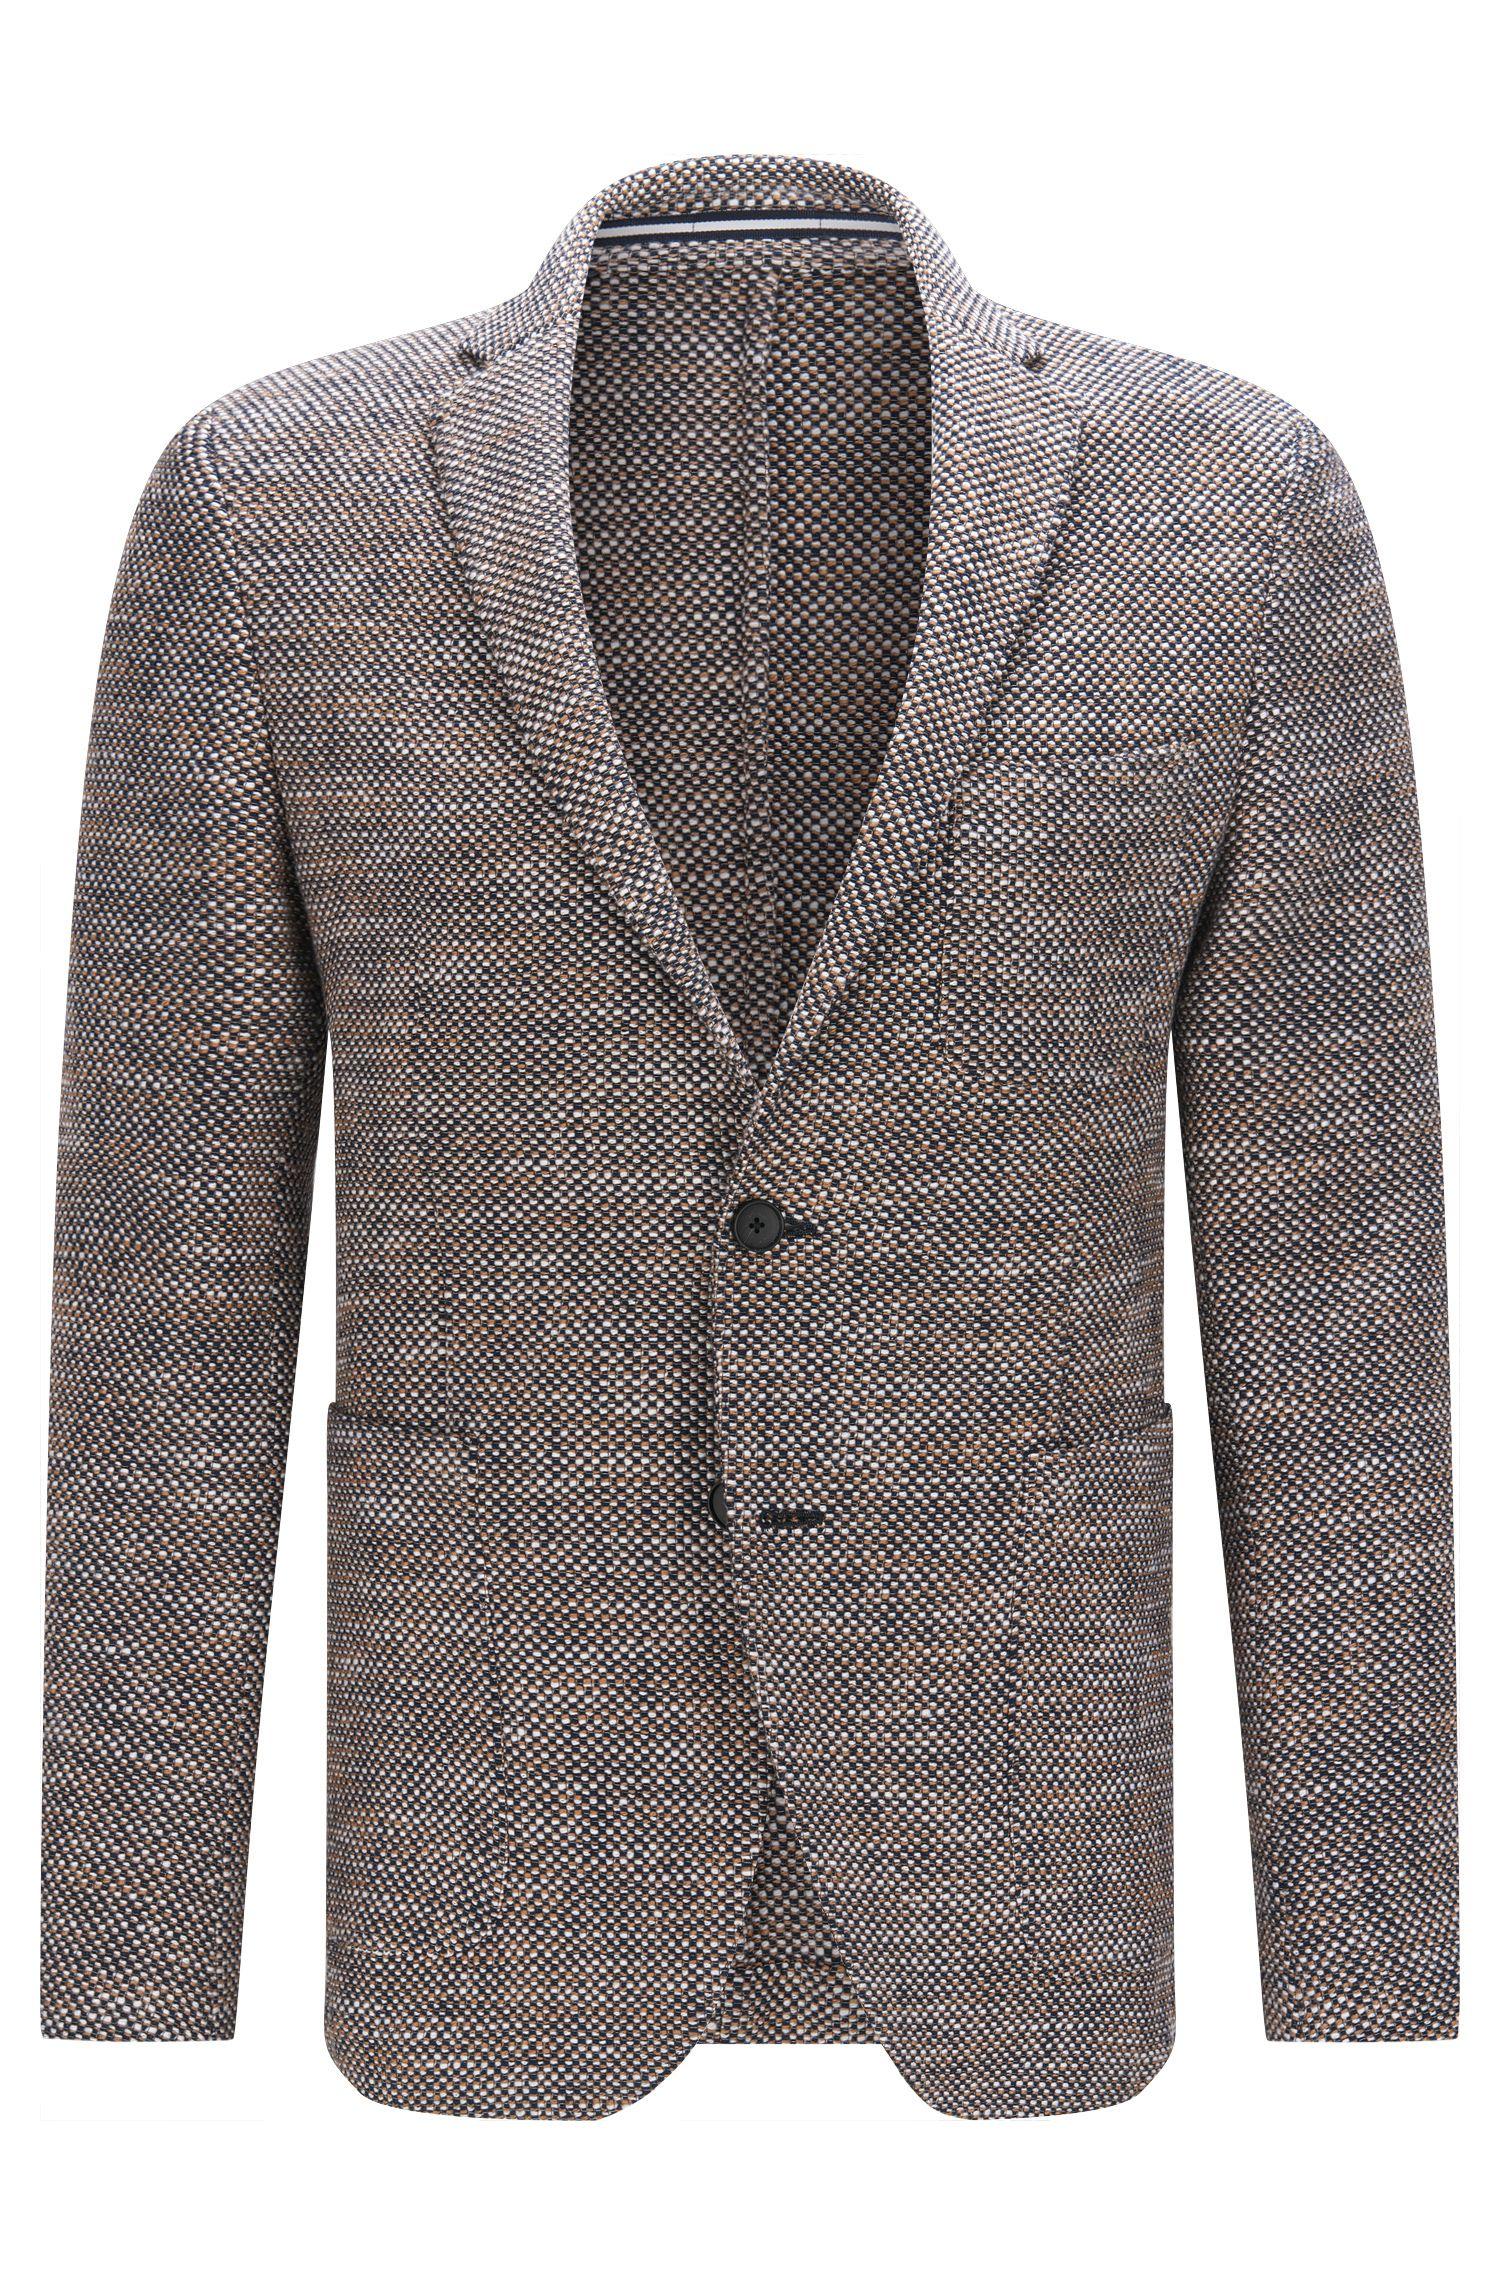 Cotton Blend Tweed Sport Coat, Slim Fit | Newon